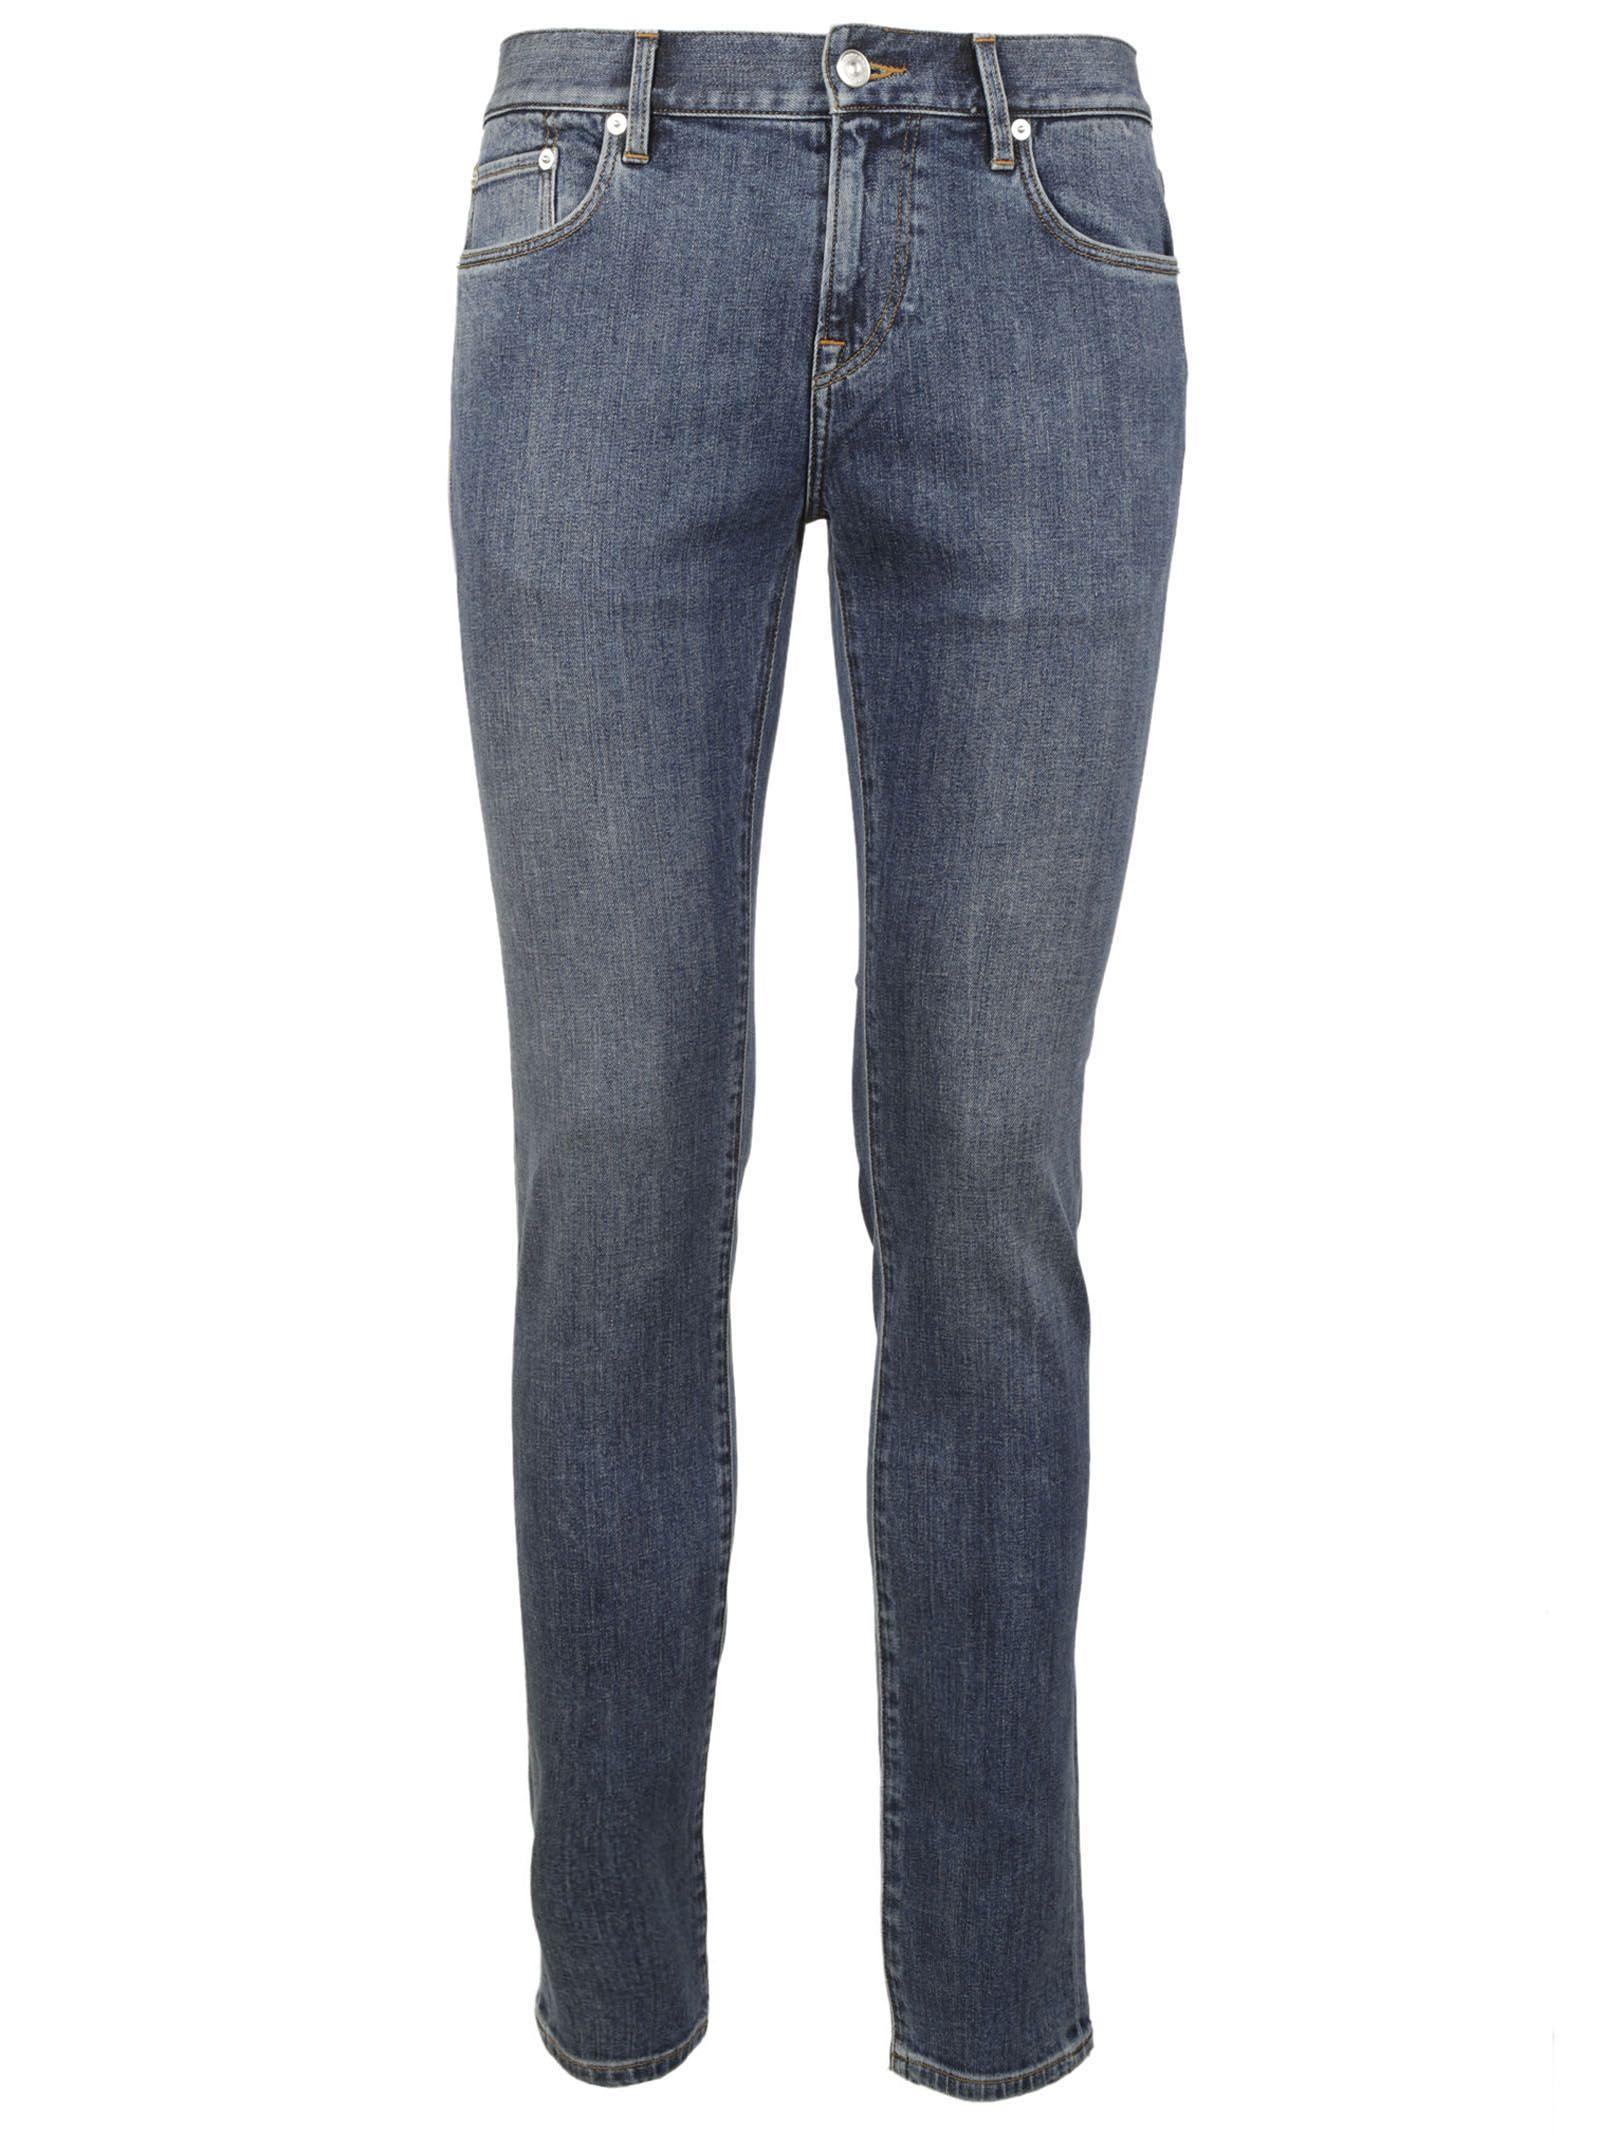 Burberry Straight Leg Jeans